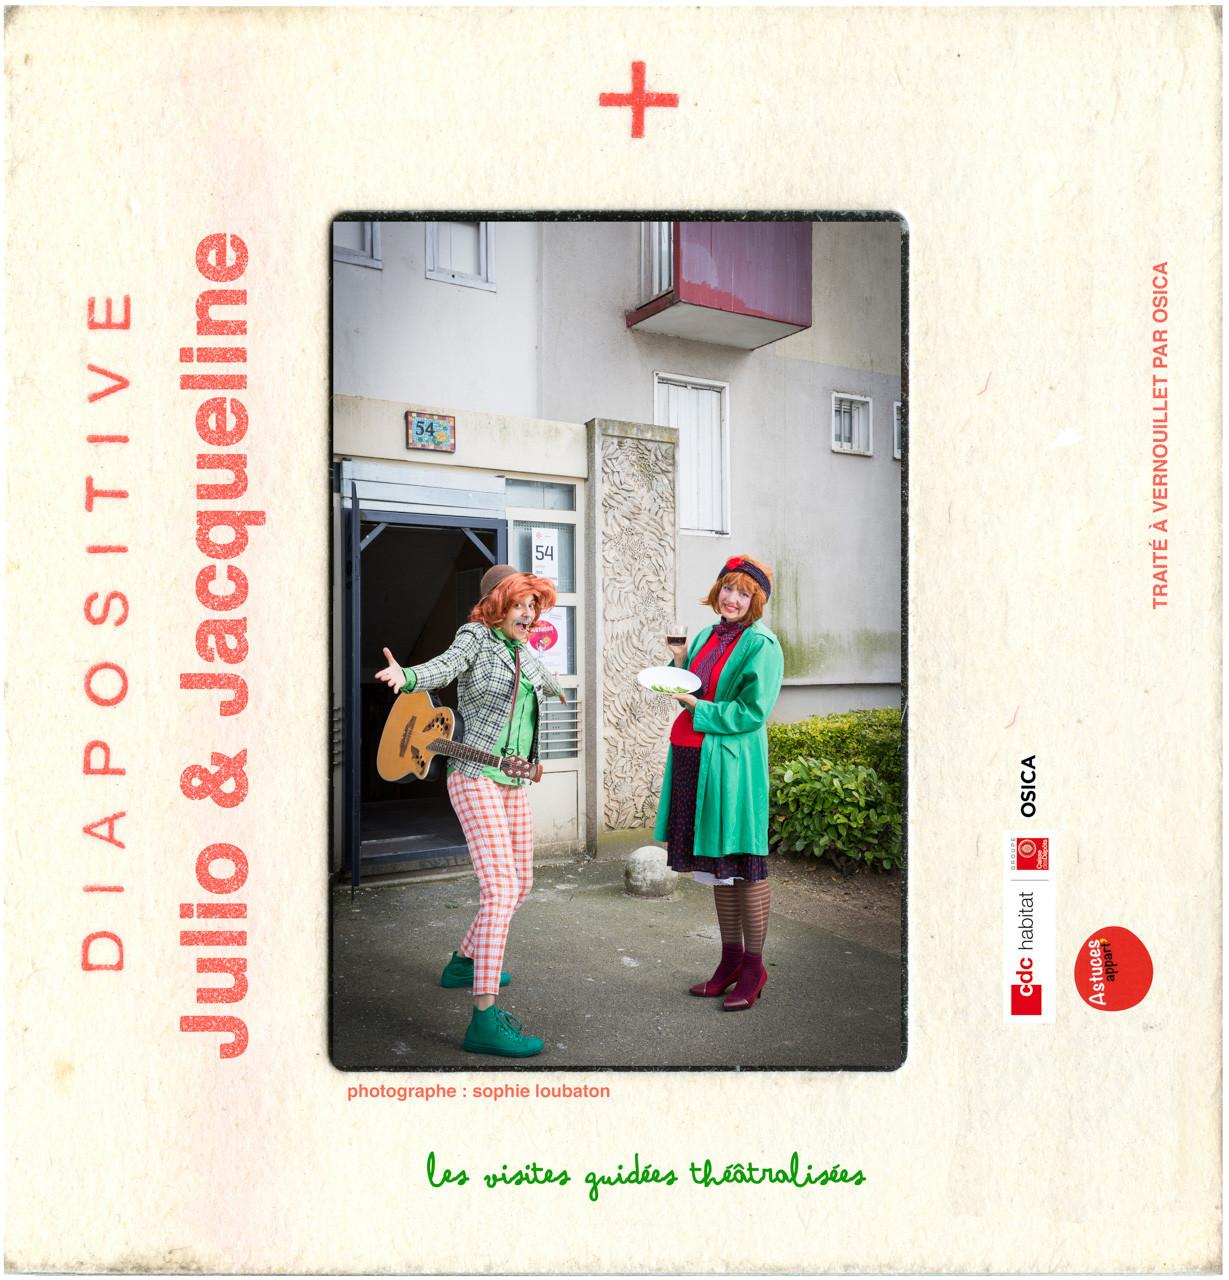 OSICA _ Compagnie La Bande Magnetique / visuels Astuce Appart. 08_visites guidees theatralisees.